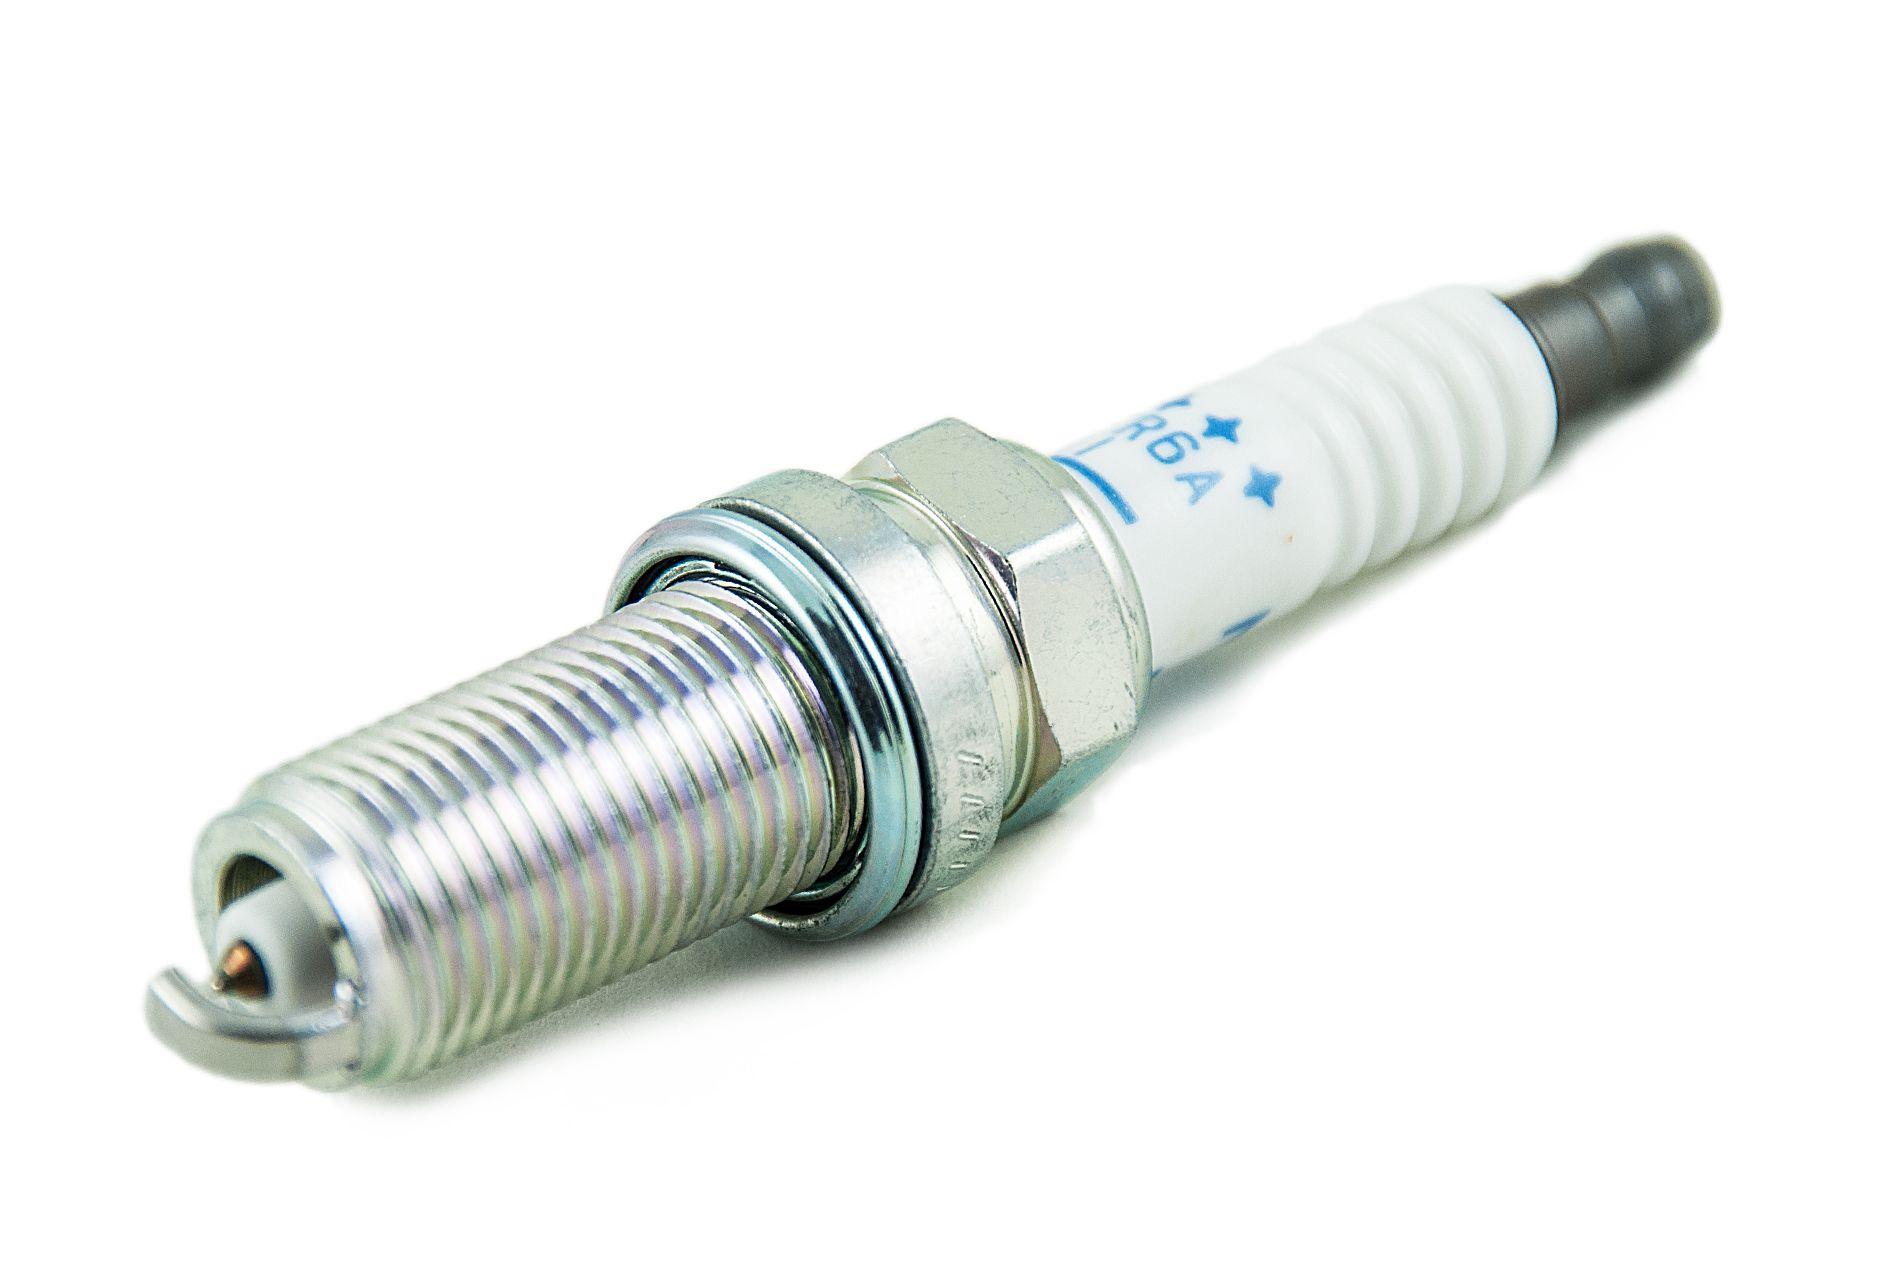 Search Concept Z Performance 1997 Nissan Maxima Spark Plugs Infiniti